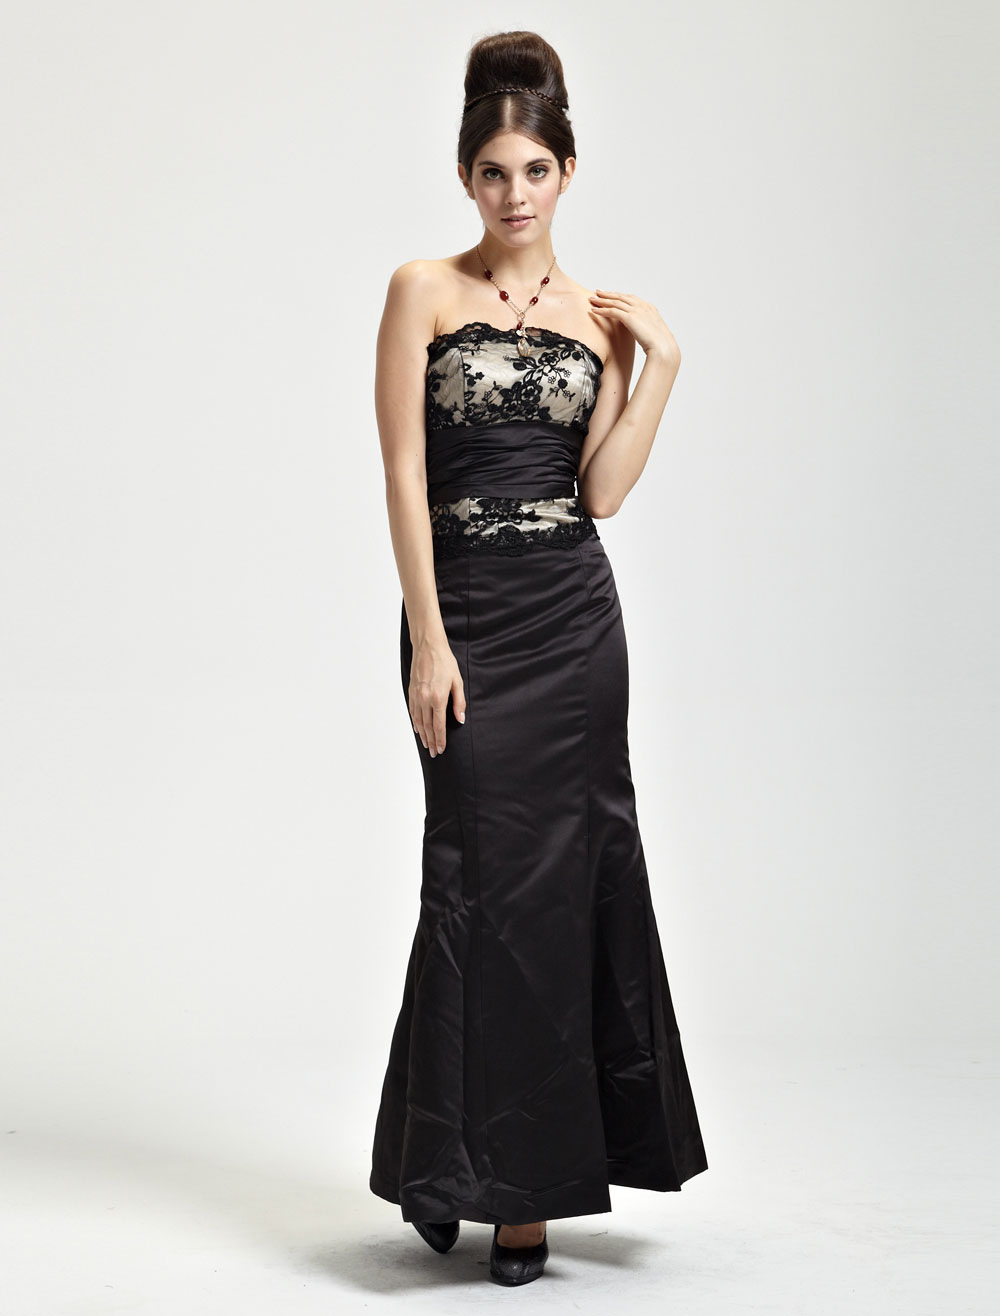 Alluring Black Satin Mermaid Trumpet Ladies Evening Dress (Wedding Evening Dresses) photo